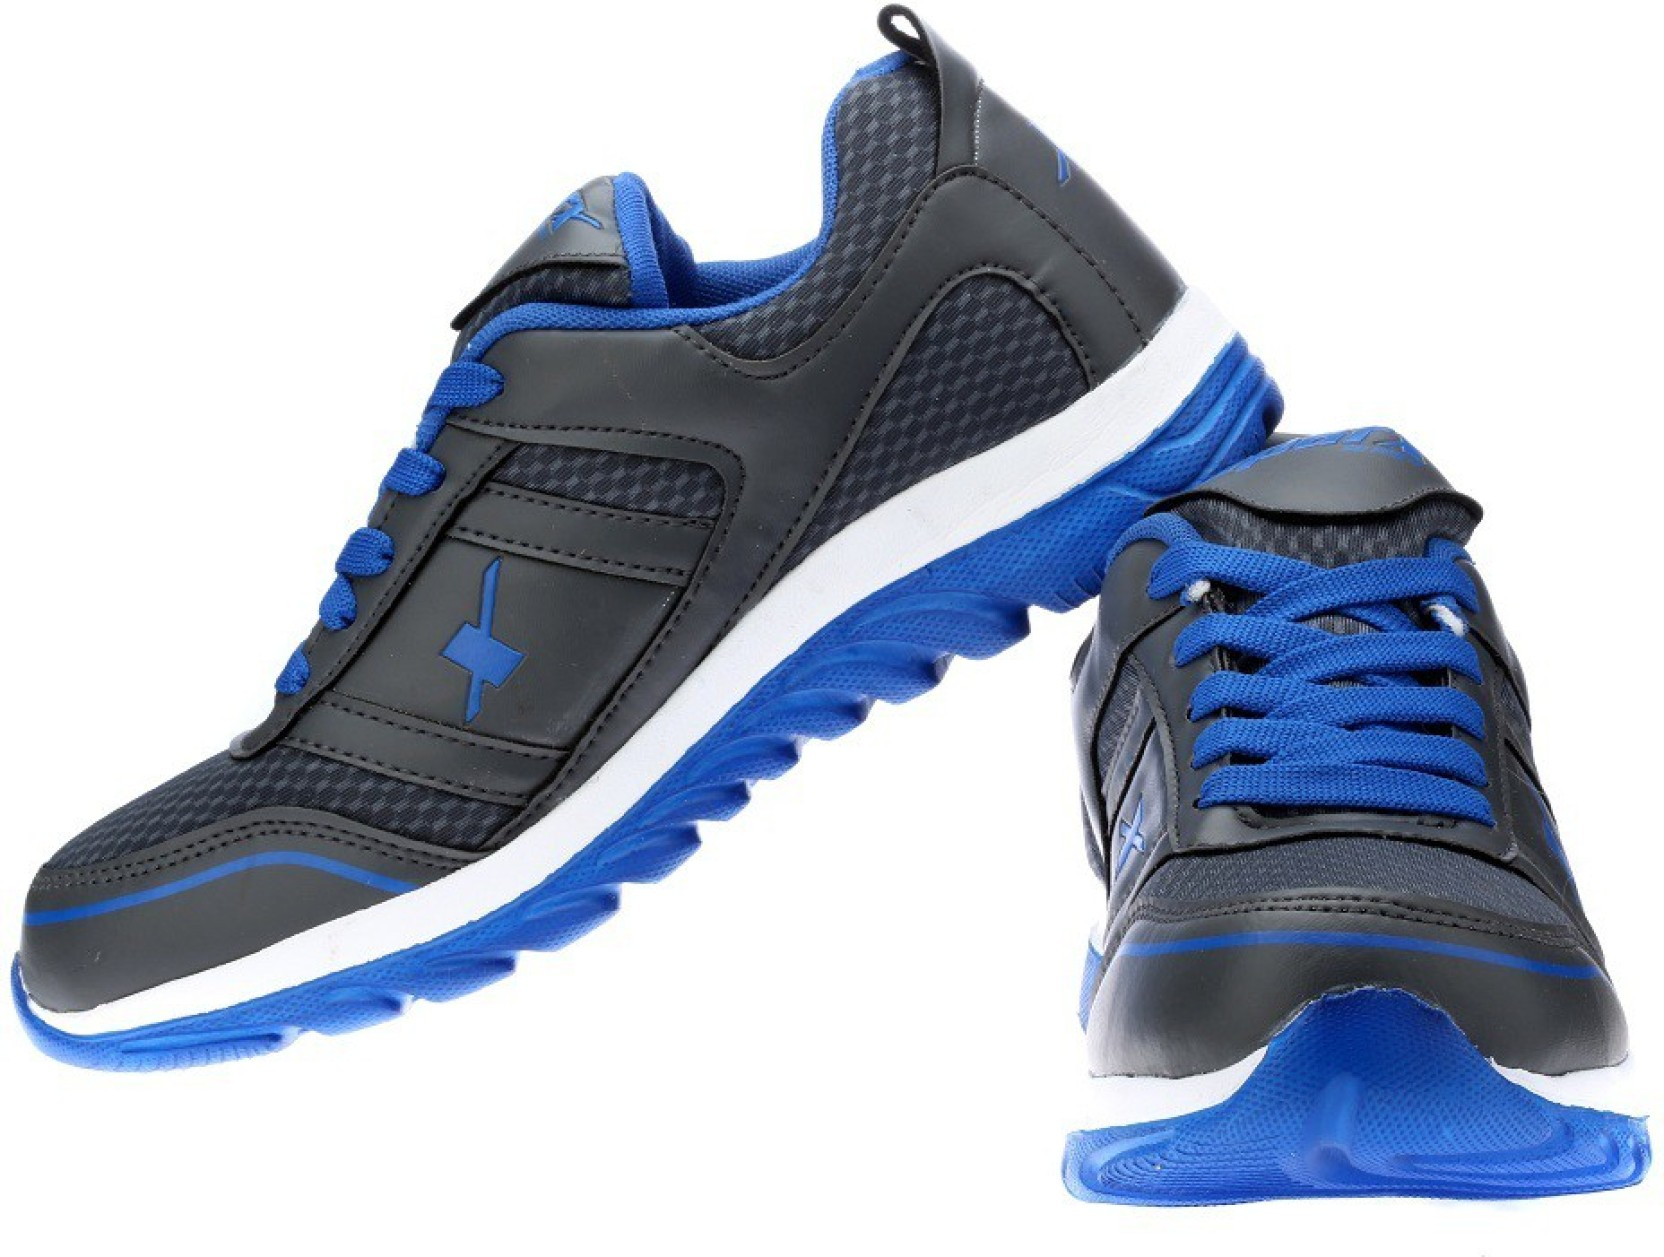 Adidas Formal Shoes Flipkart